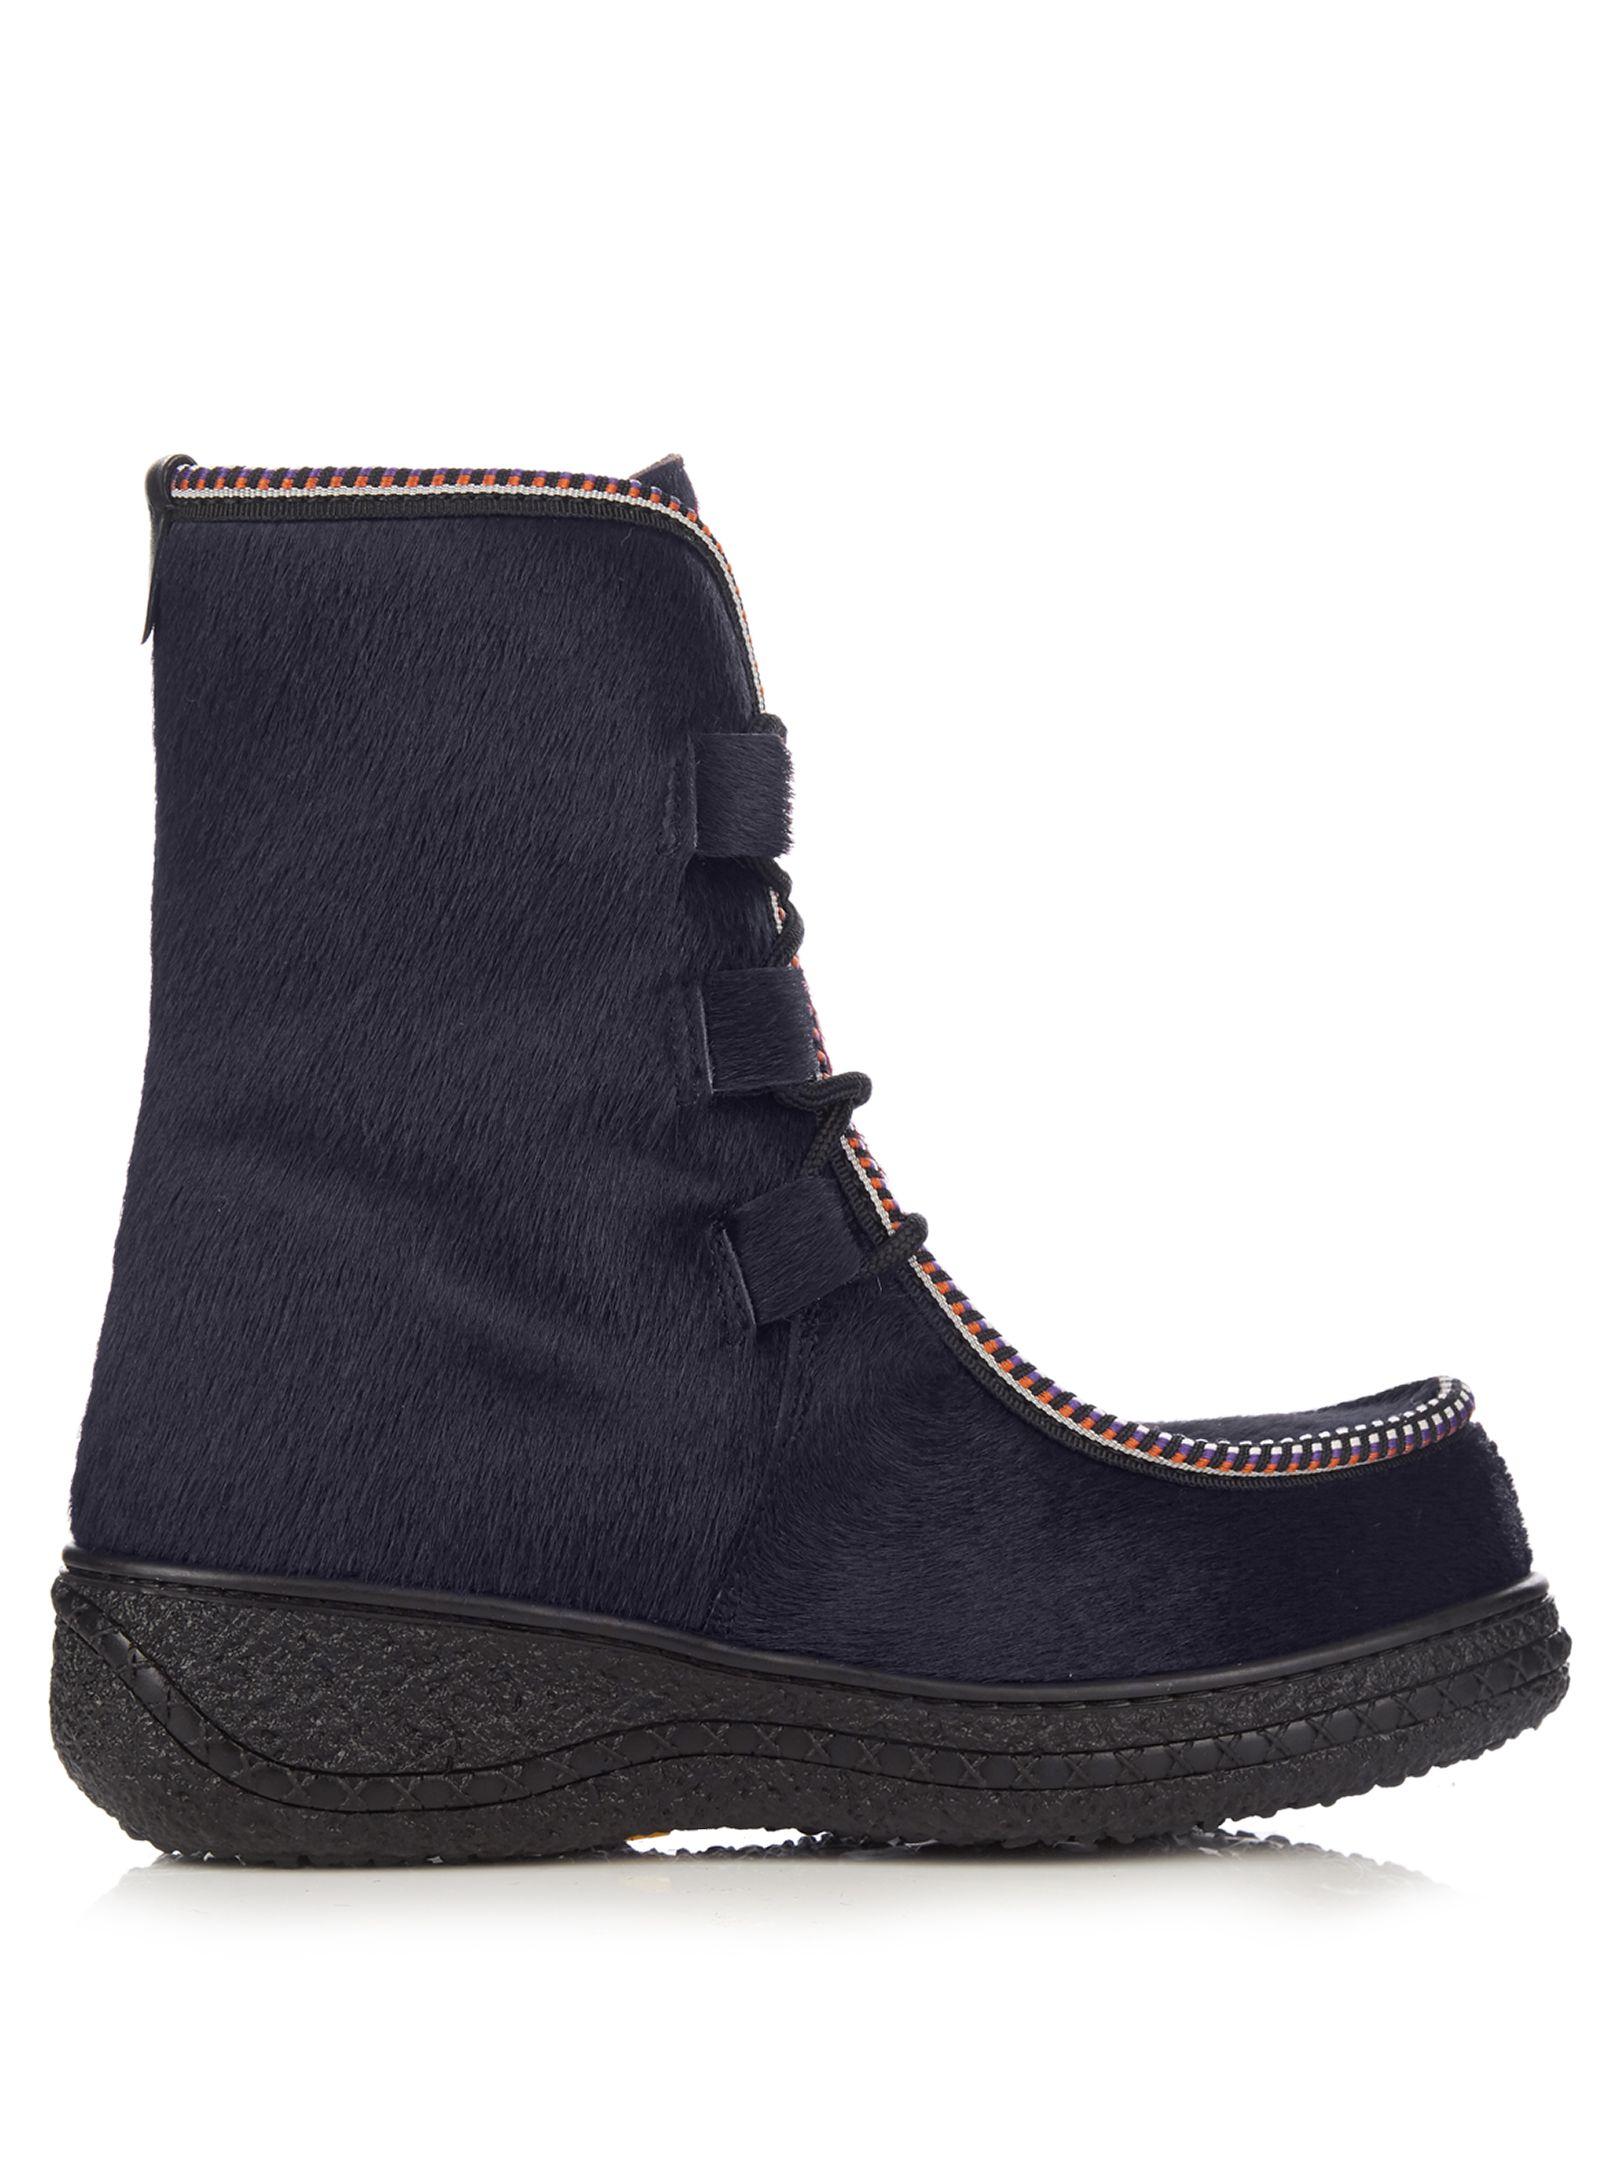 e7c7953c060ba9 1096 wool-lined après-ski boots